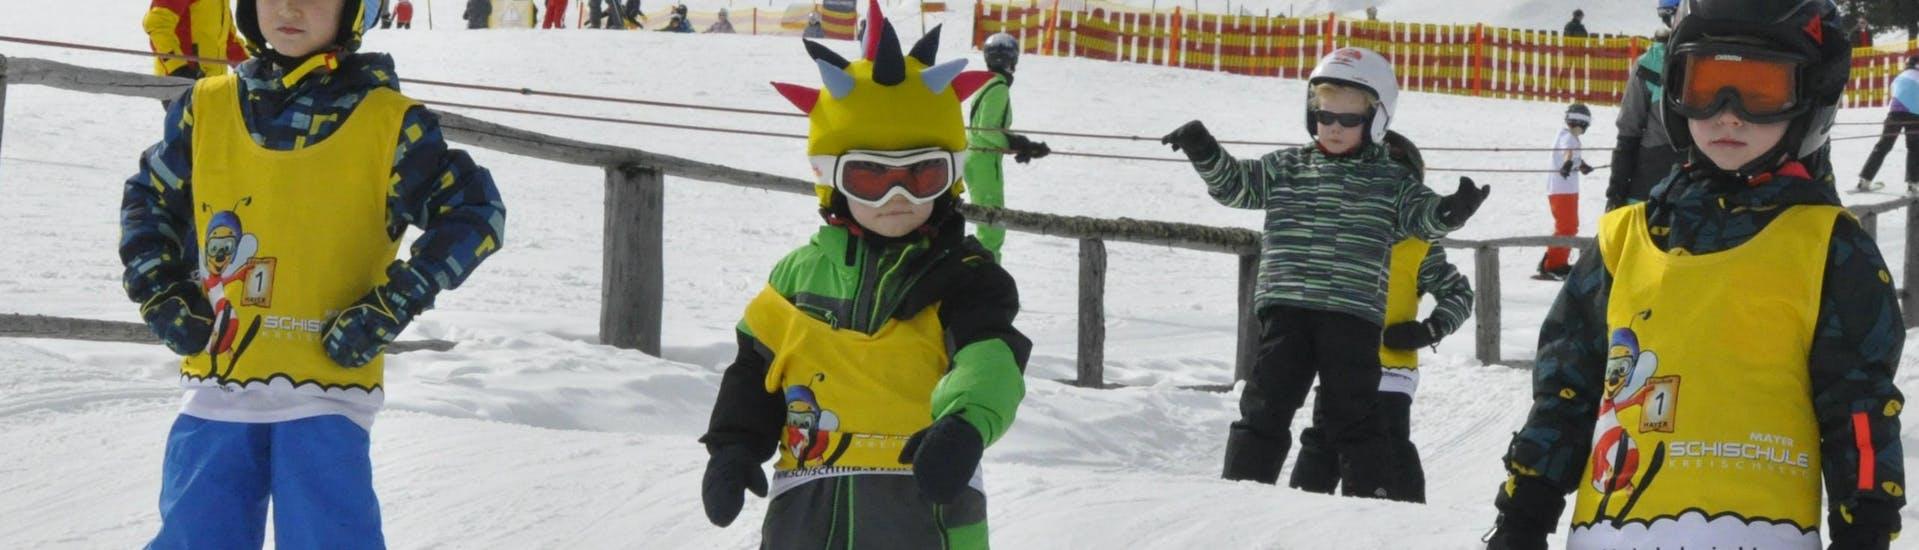 Kids Ski Lessons (4-12 y.) for Advanced Skiers